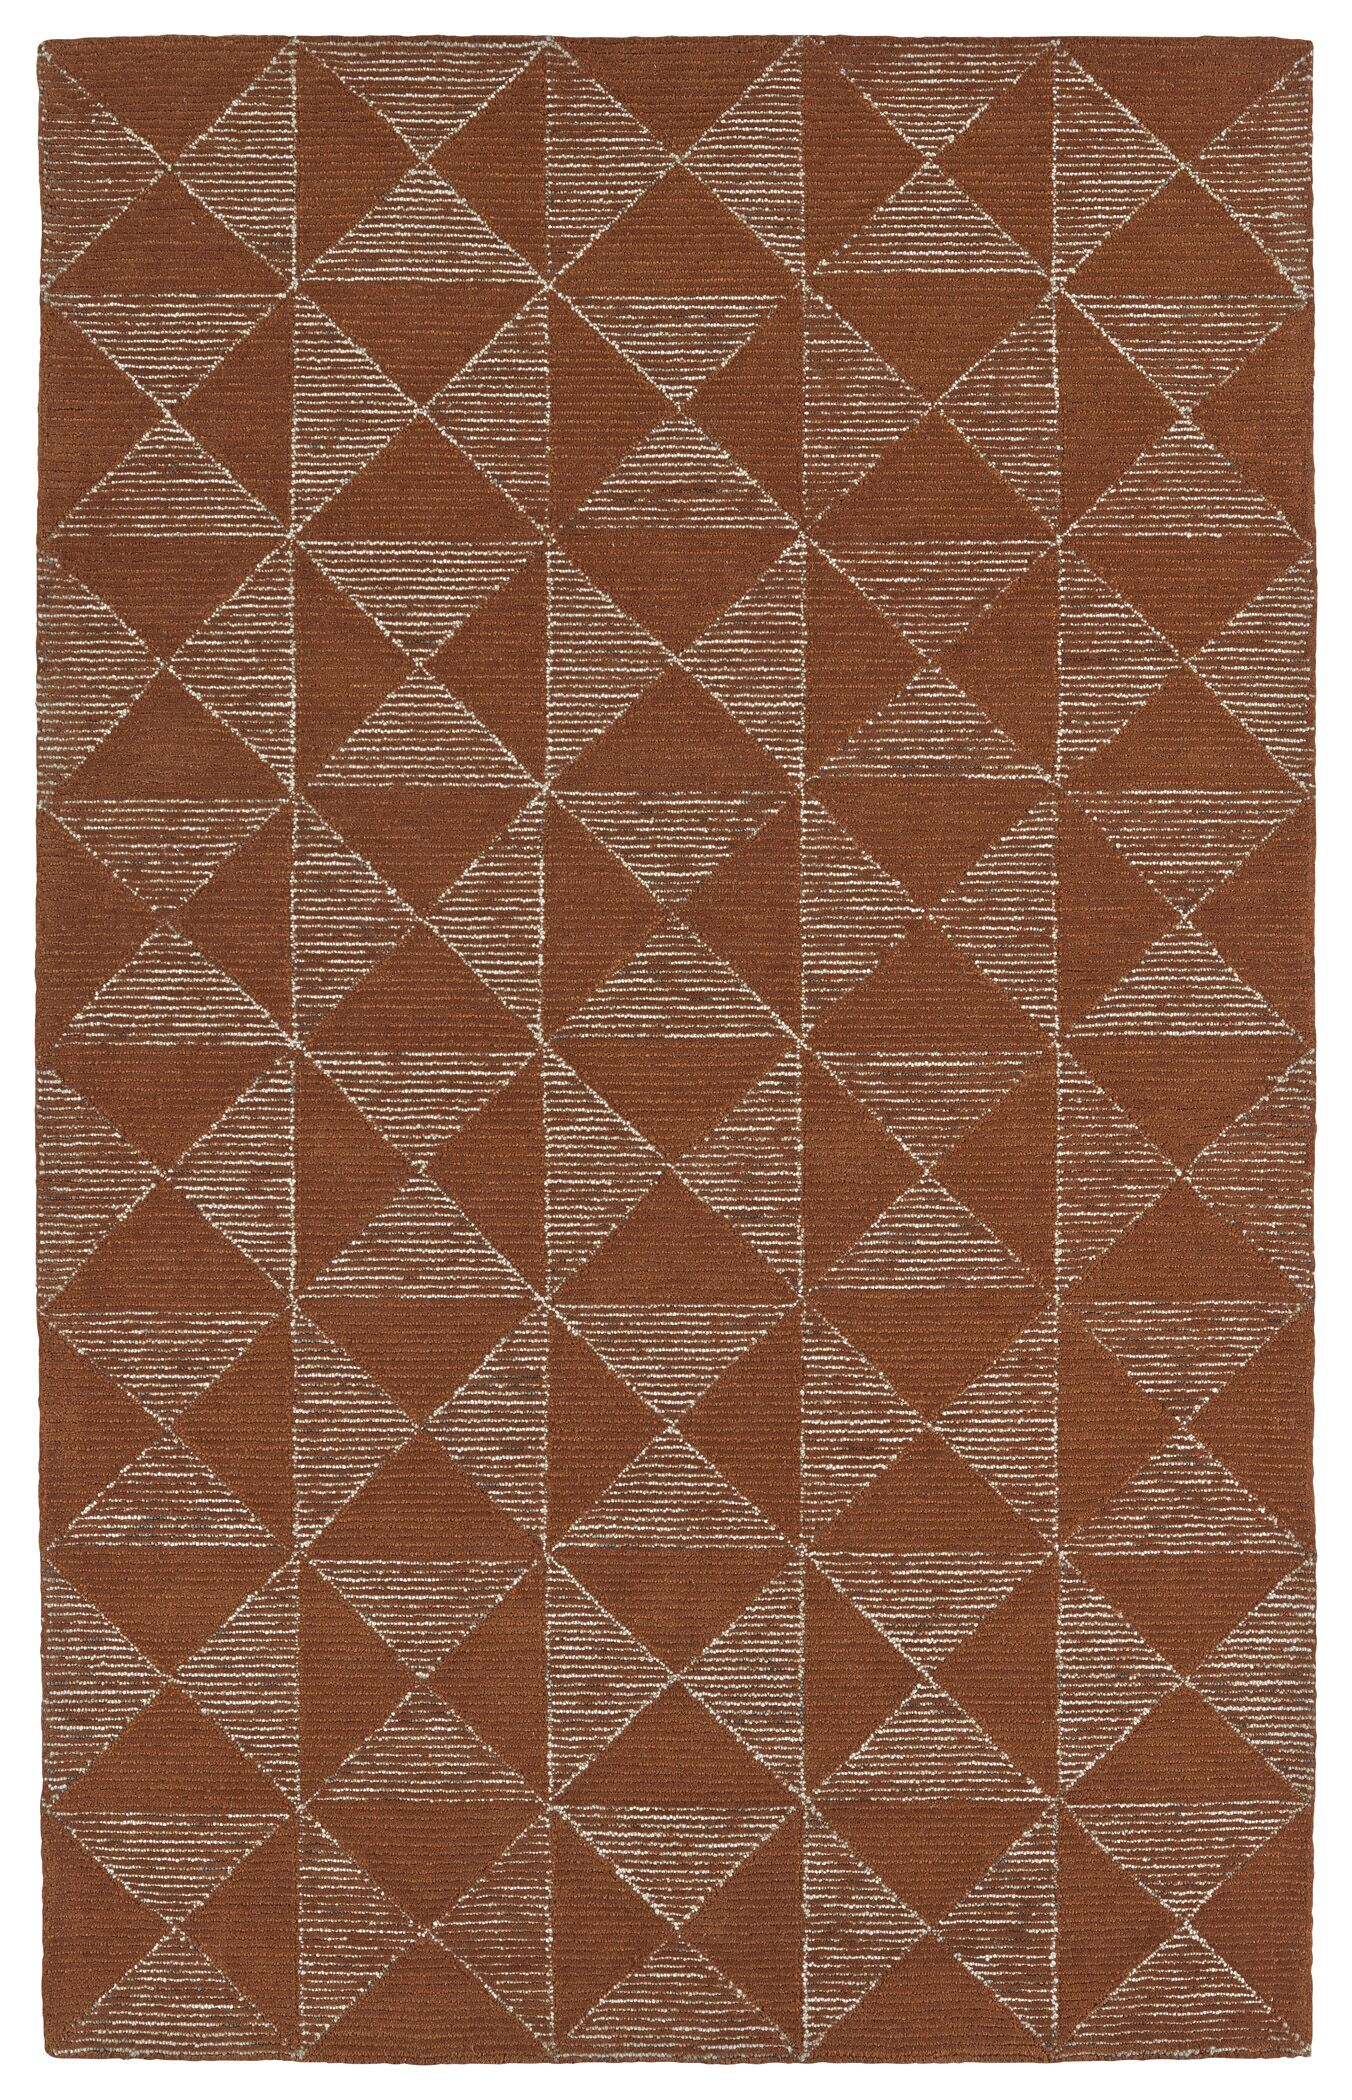 Cilegon Hand-Tufted Paprika/Linen Area Rug Rug Size: Rectangle 3'6